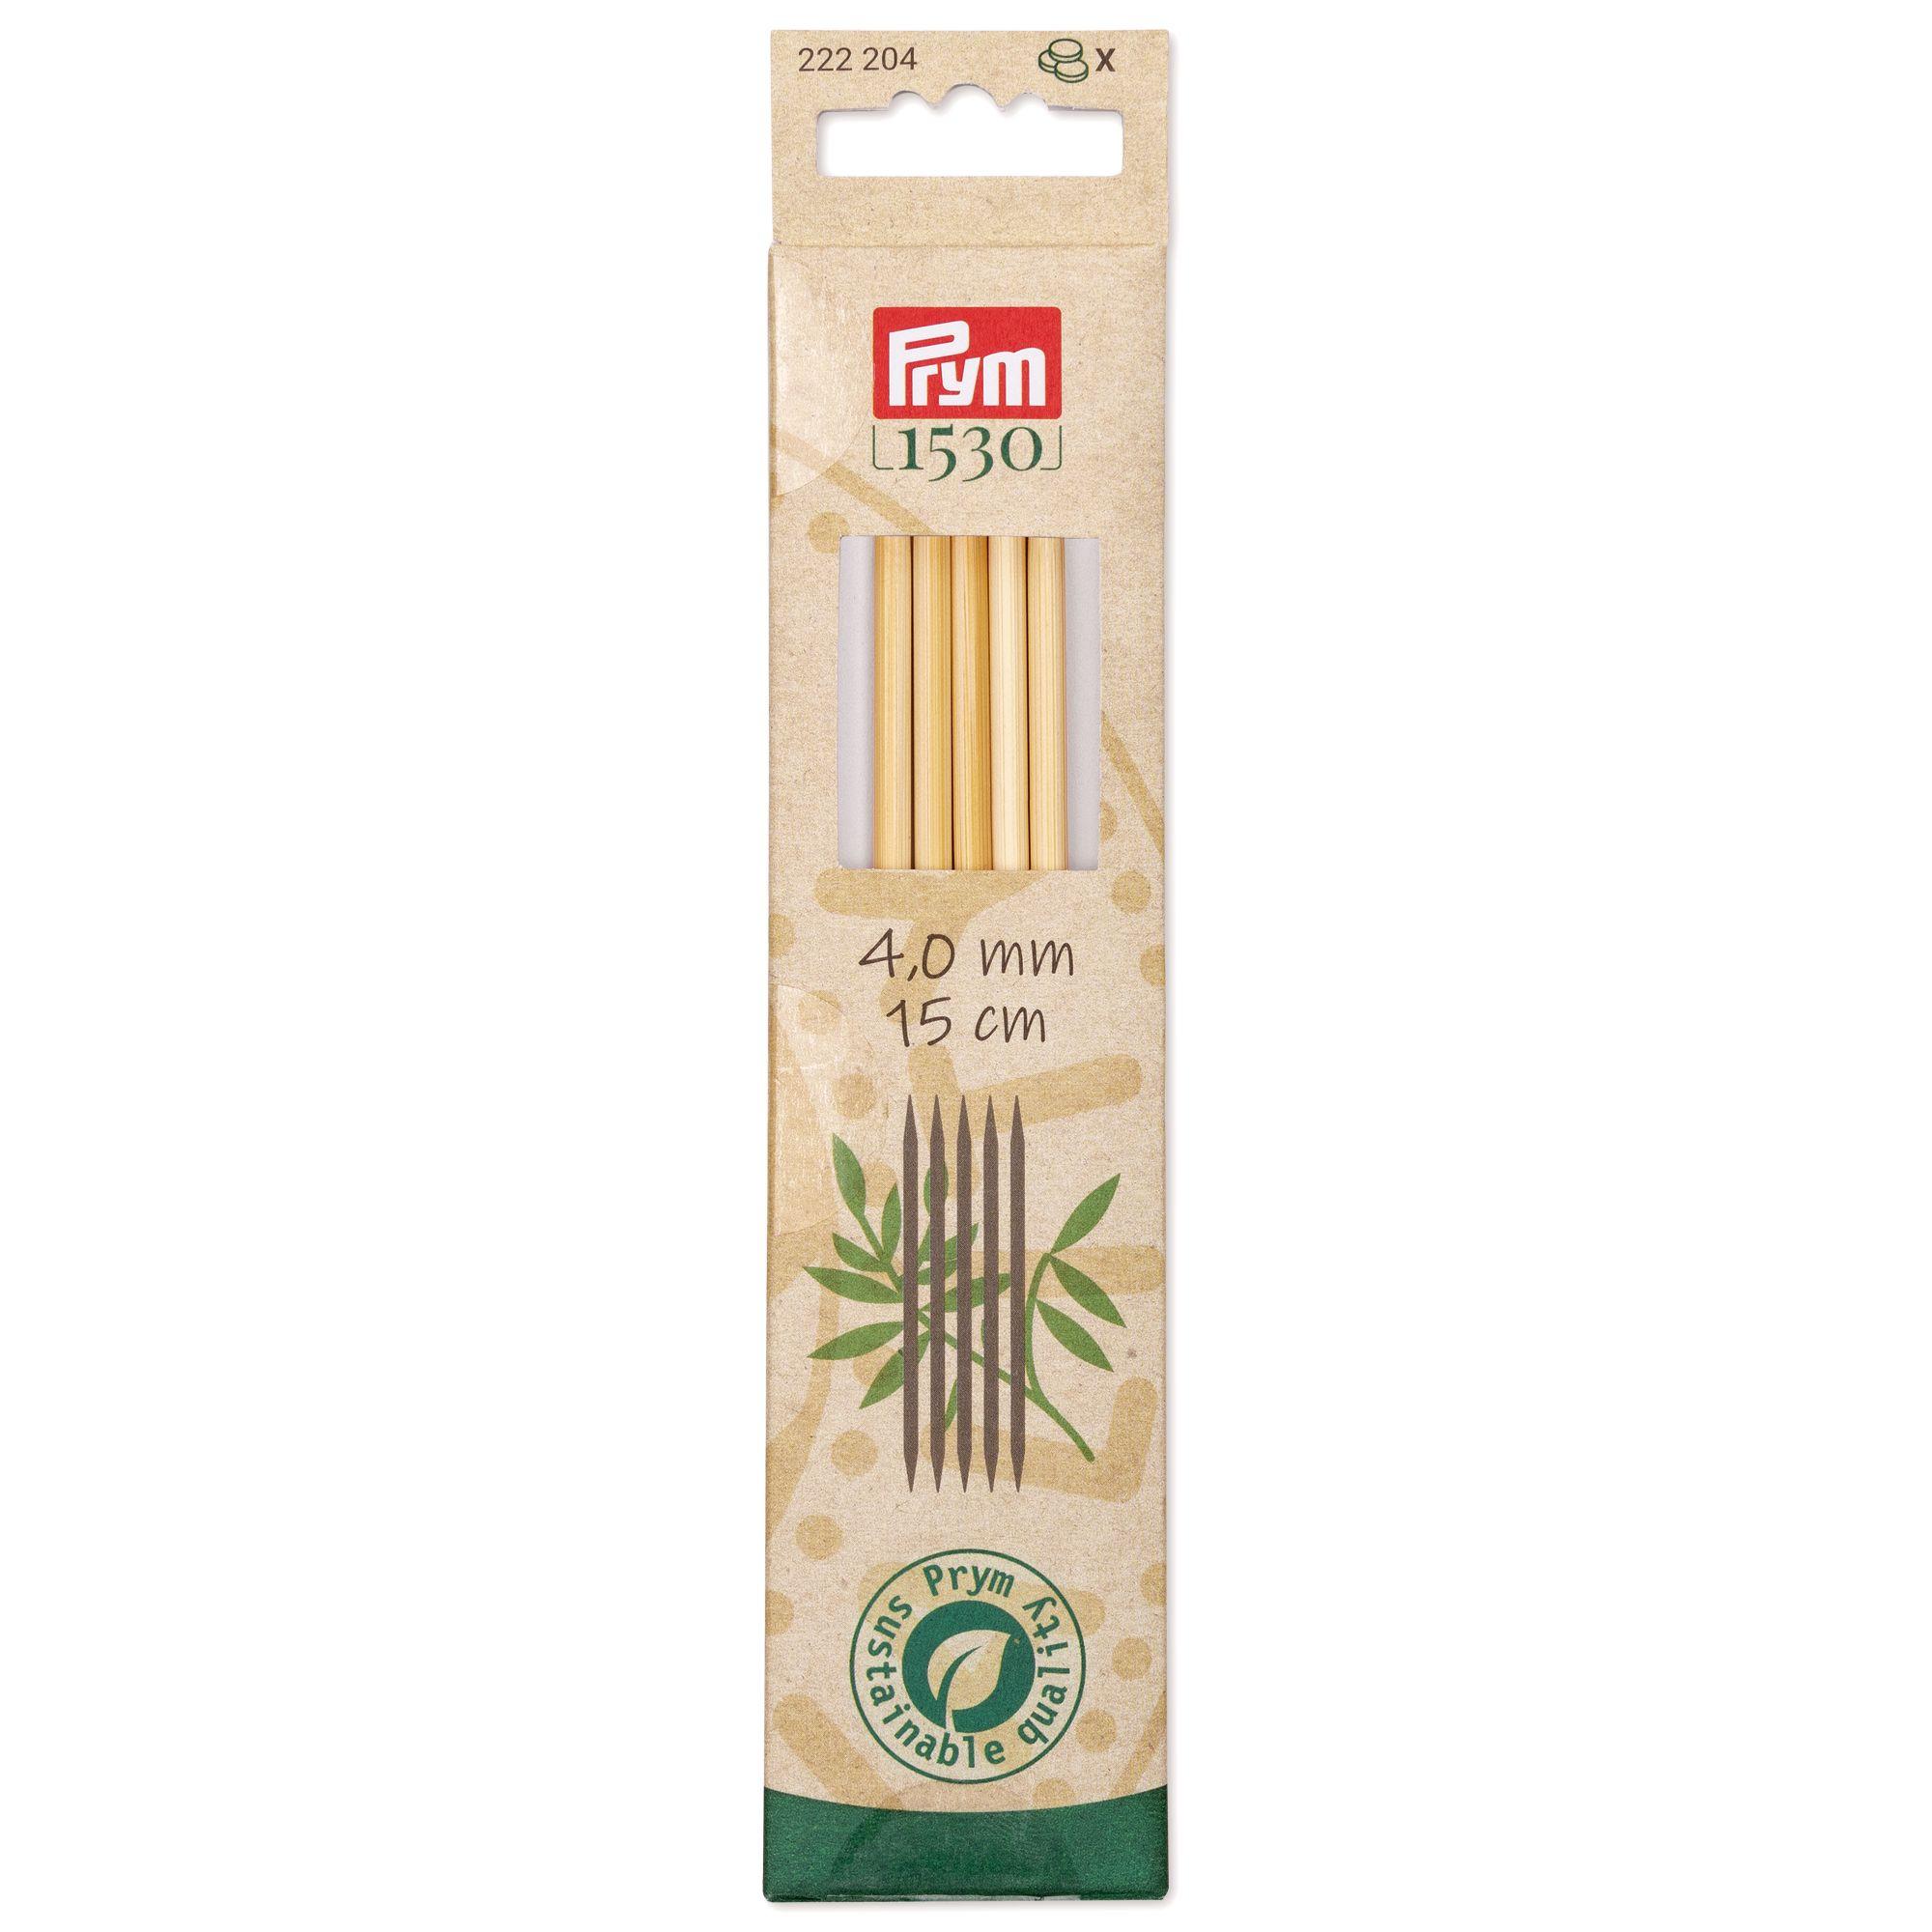 Prym 222204 Strumpfstricknadeln Bambus